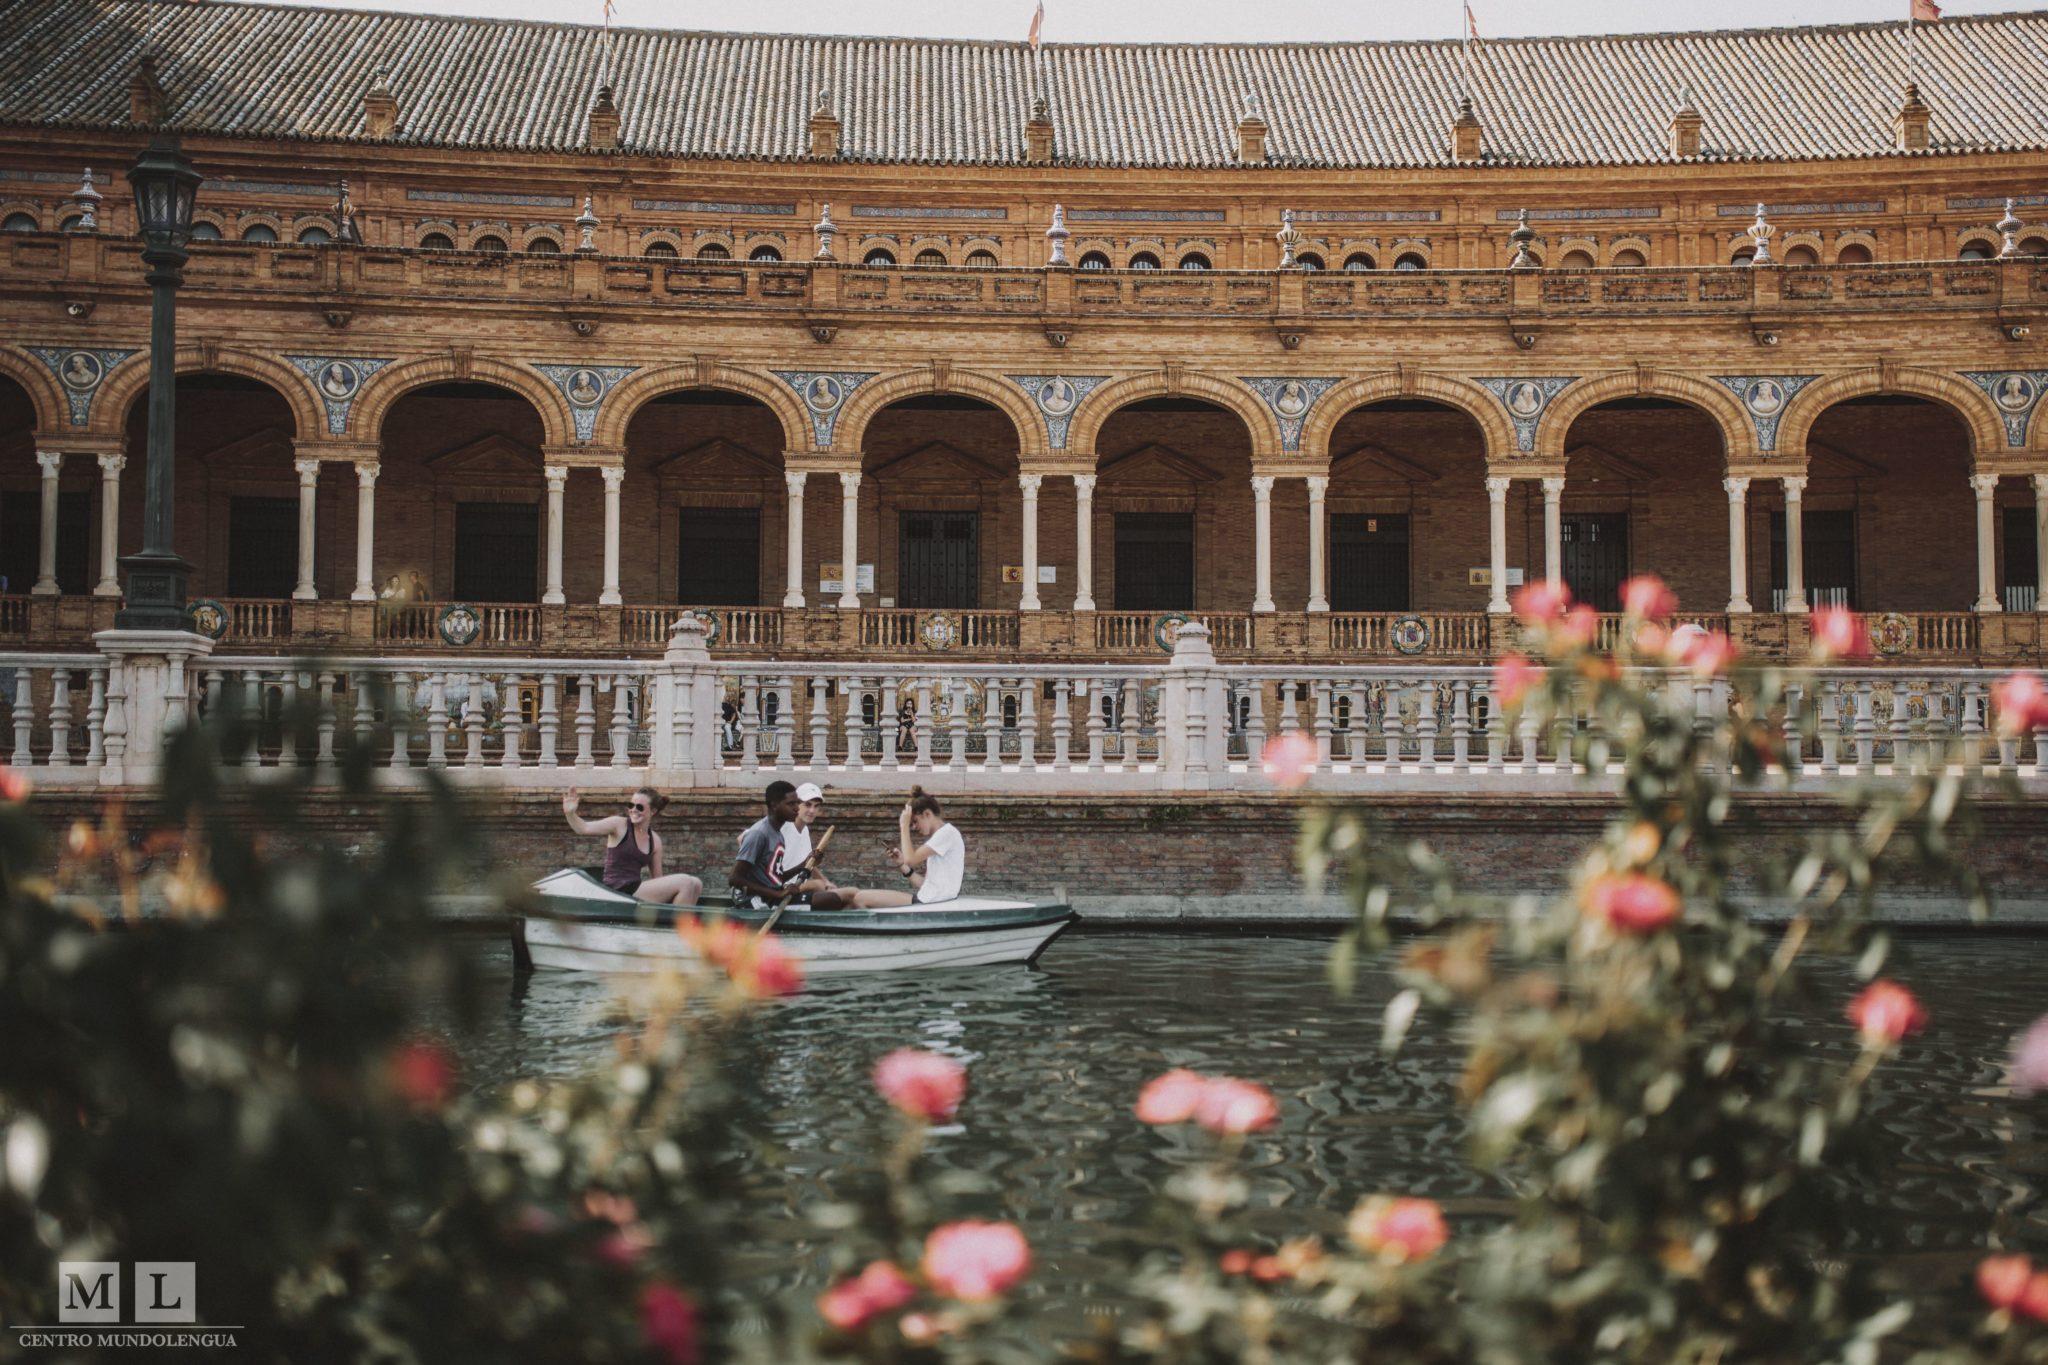 Excursion to Sevilla - MundoLengua´s programs